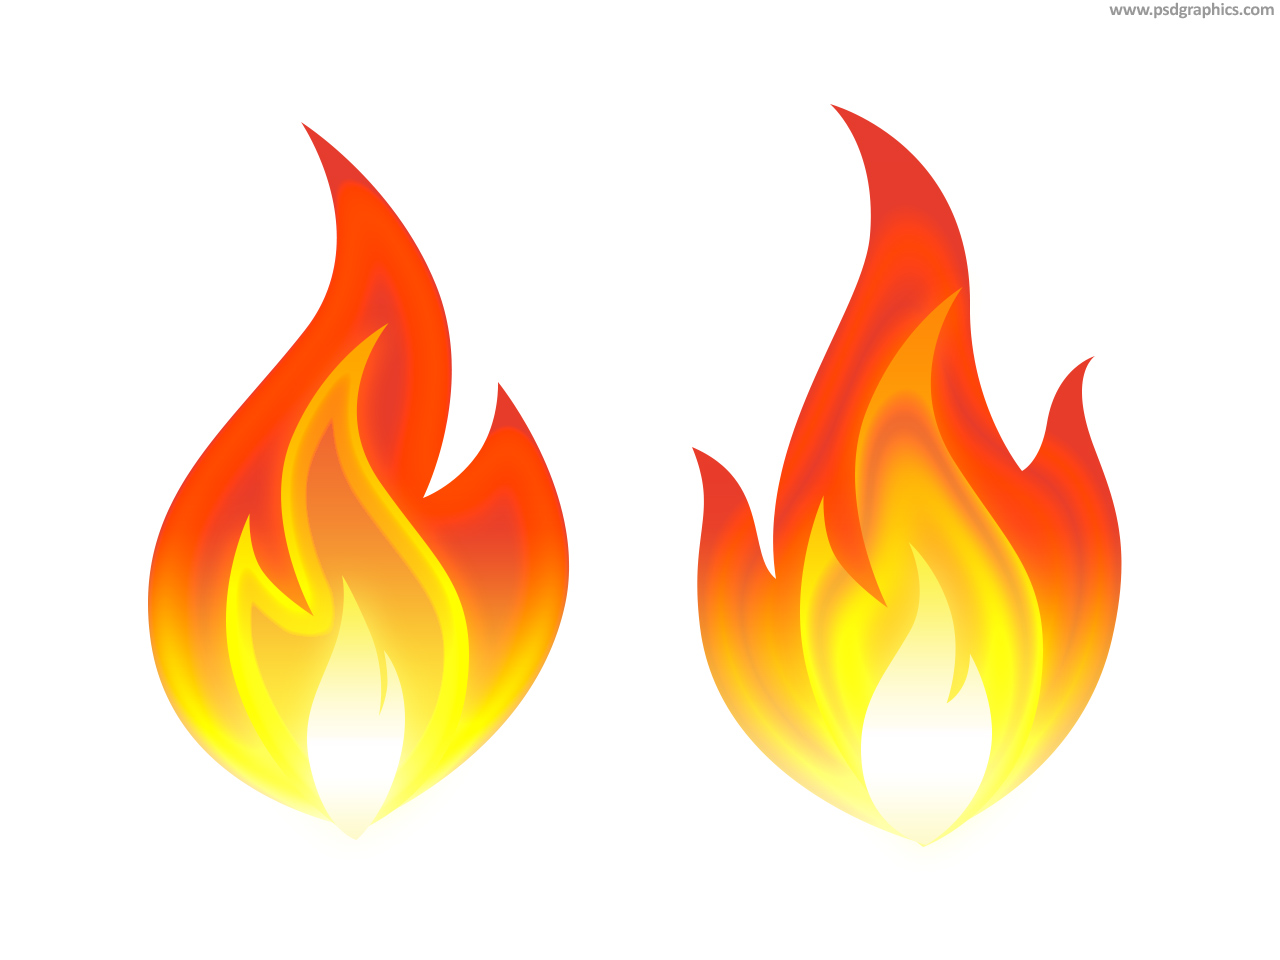 Psd flame icon psdgraphics flame symbol psd buycottarizona